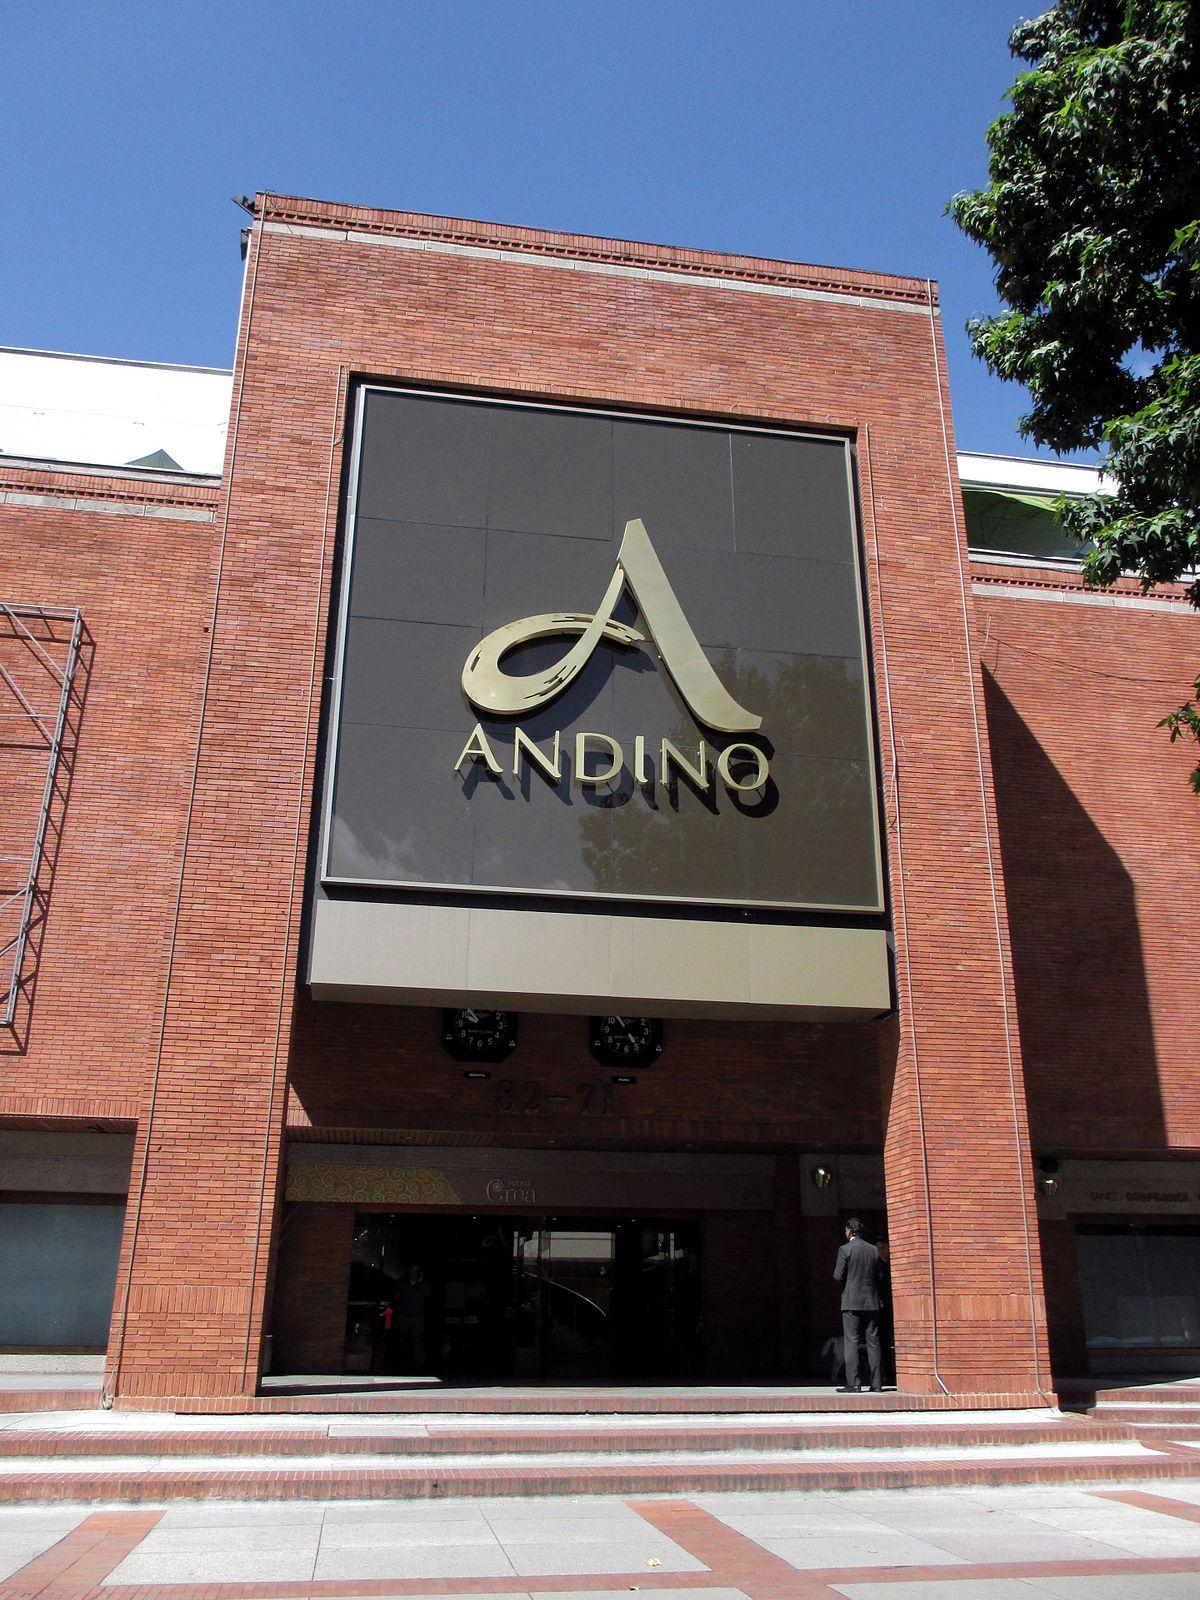 Centro comercial Andino - Wikipedia, la enciclopedia libre